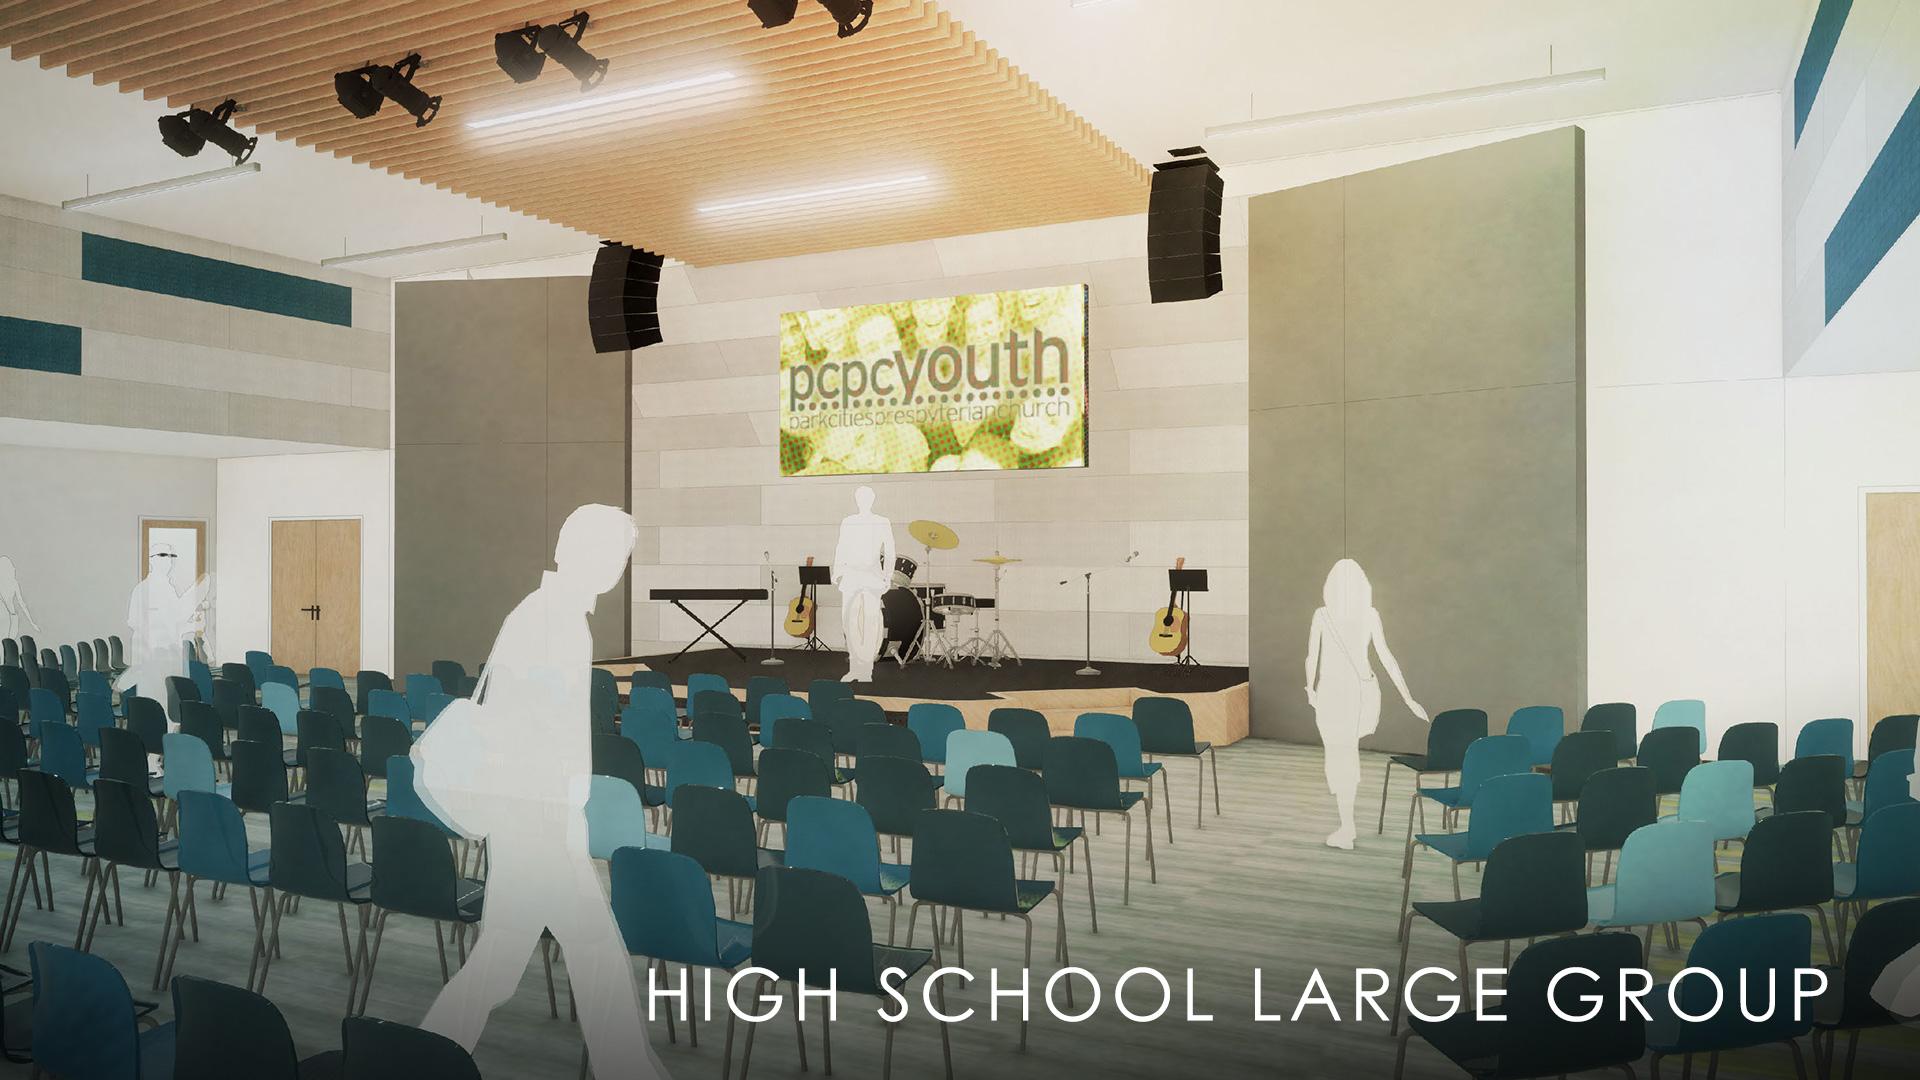 HighSchoolLargeGroup-1920x1080.jpg